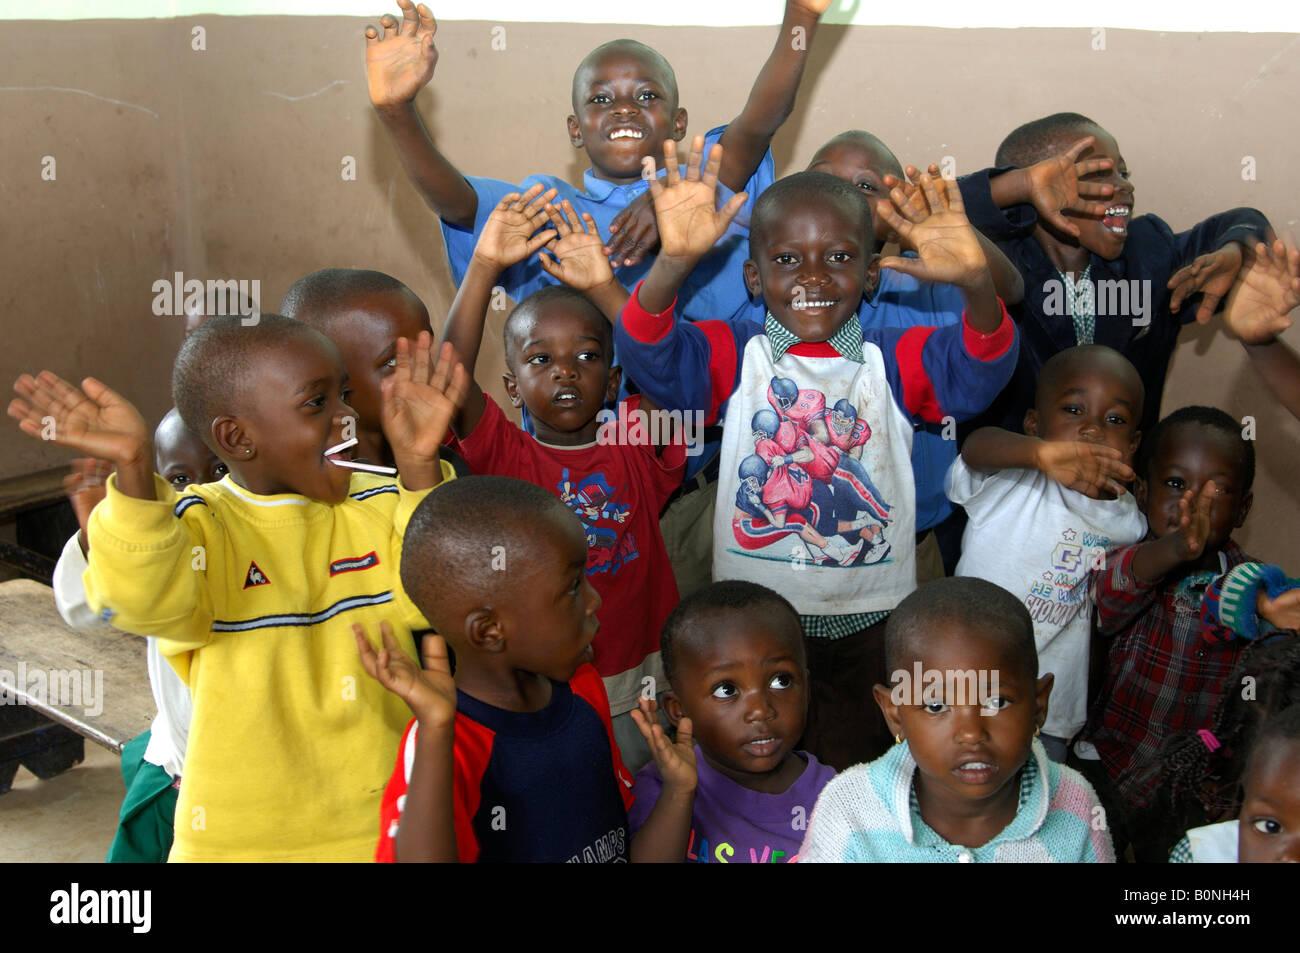 Rackety pre-school children in a day care centre in Akropong Akwapim, Eastern Region, Ghana - Stock Image